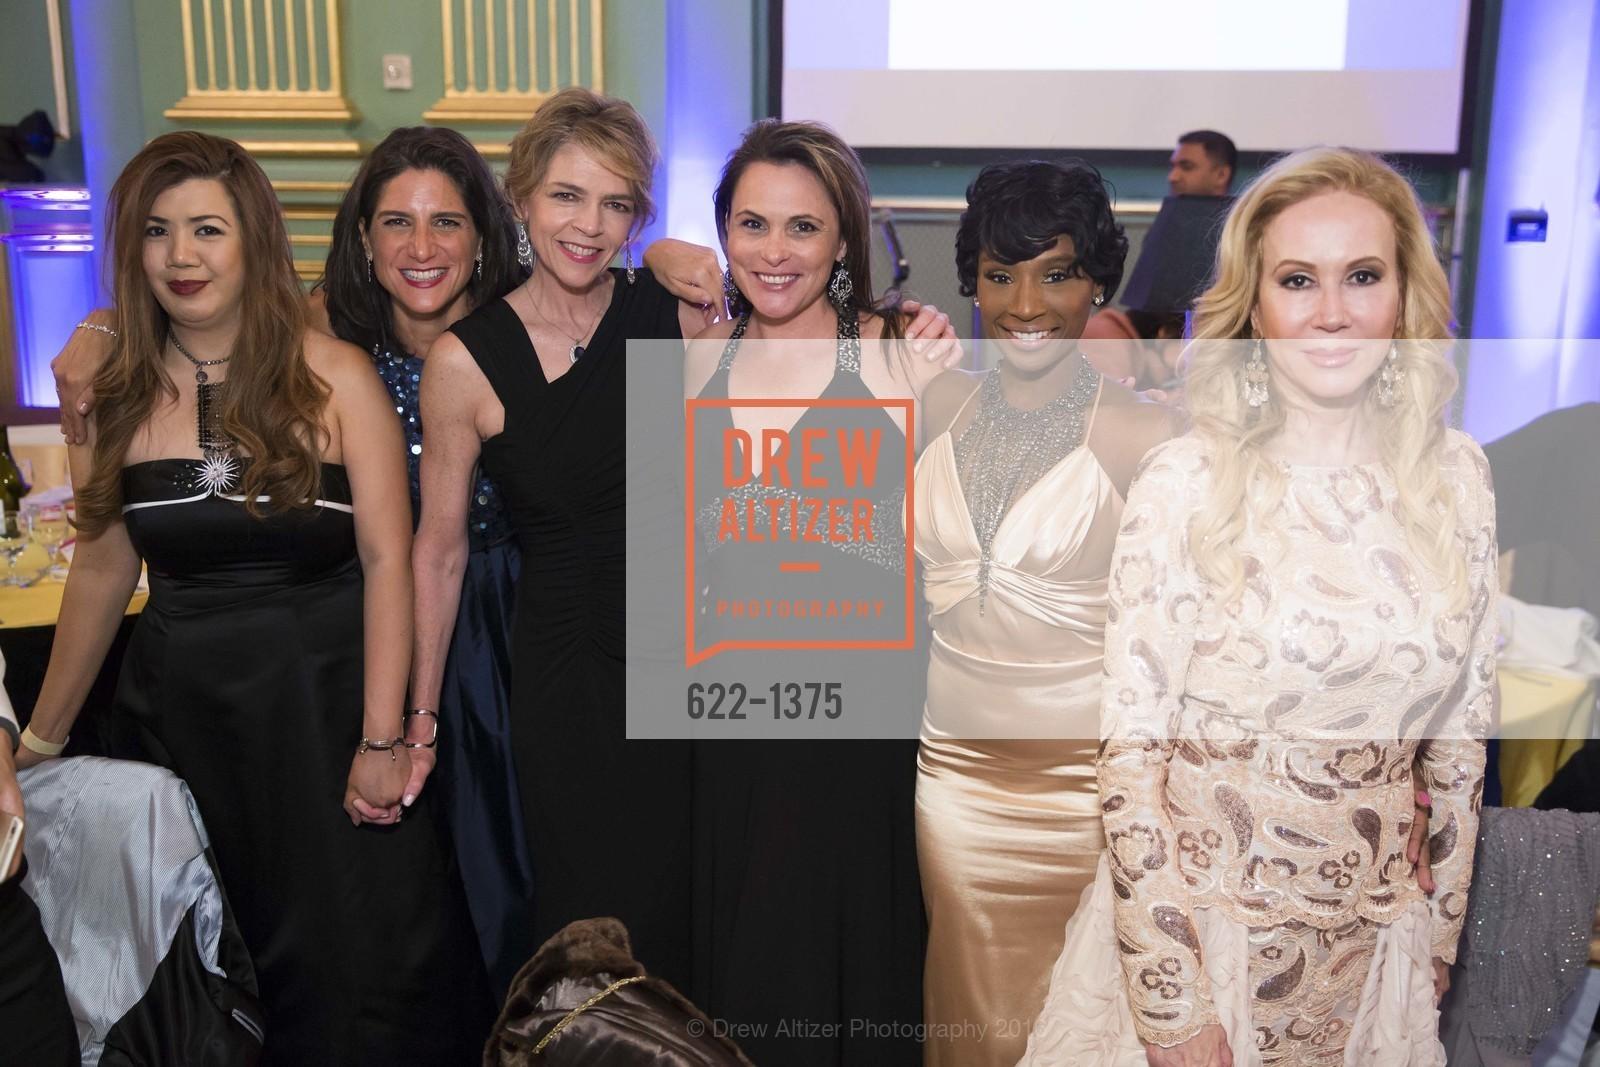 Kaye Cloutman, Vivian Panou, Beth Schnitzer, Teresa Rodriguez, Pernella Sommerville, Sophie Azouaou, Photo #622-1375